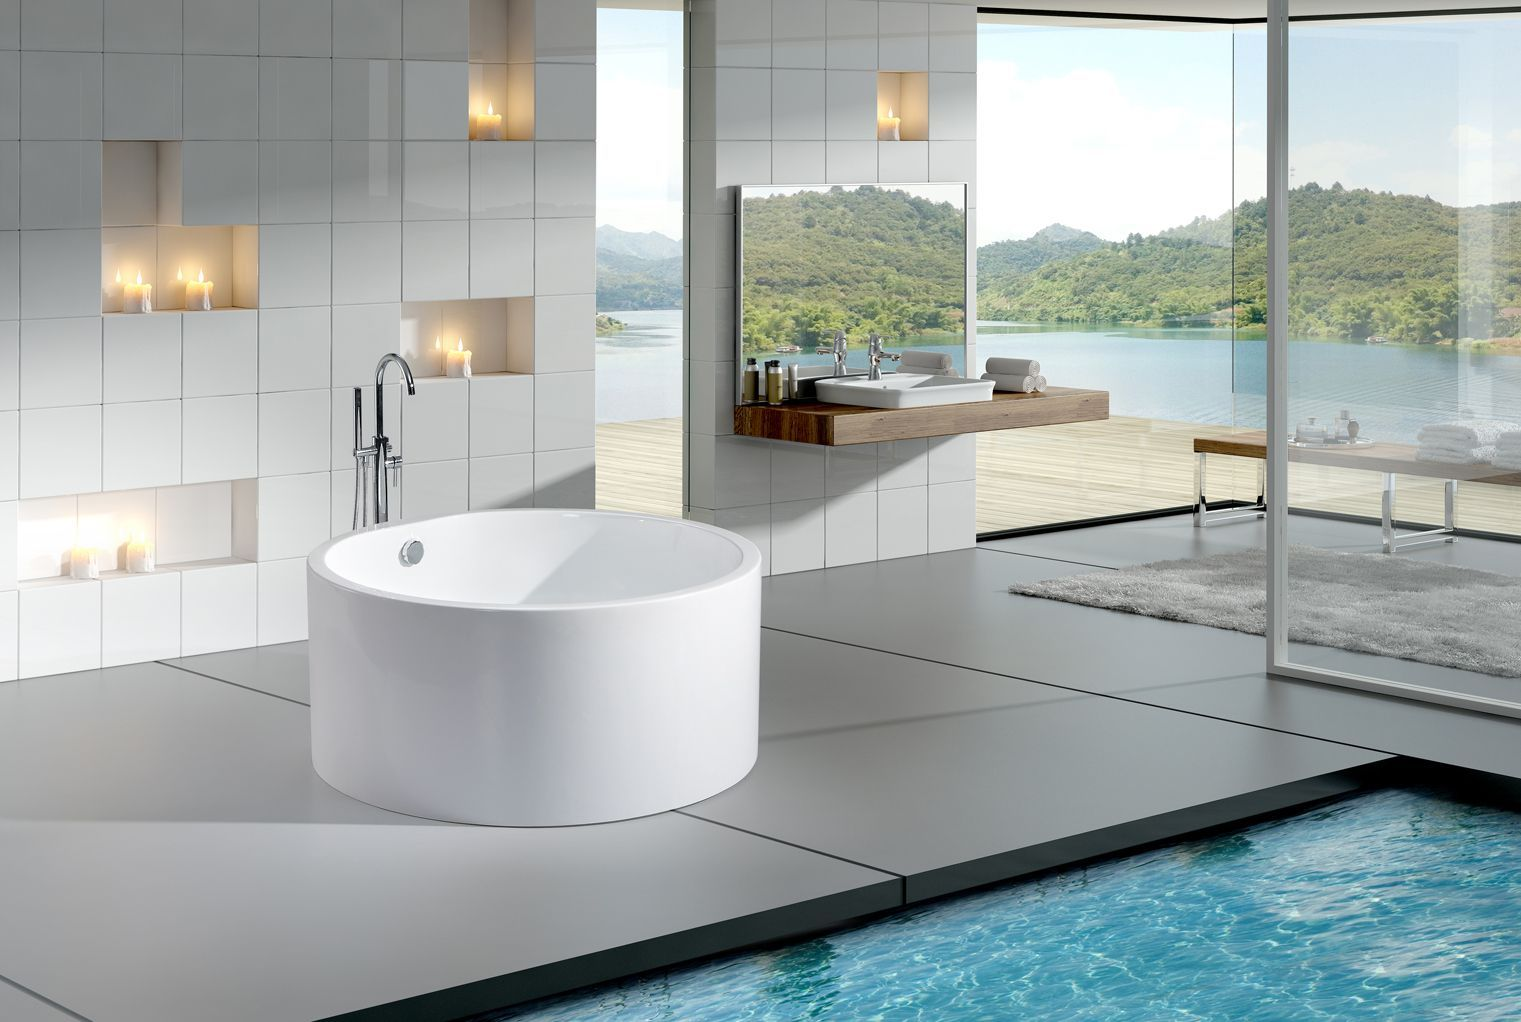 WHY I SHOULD GO WITH ROUND BATHTUB